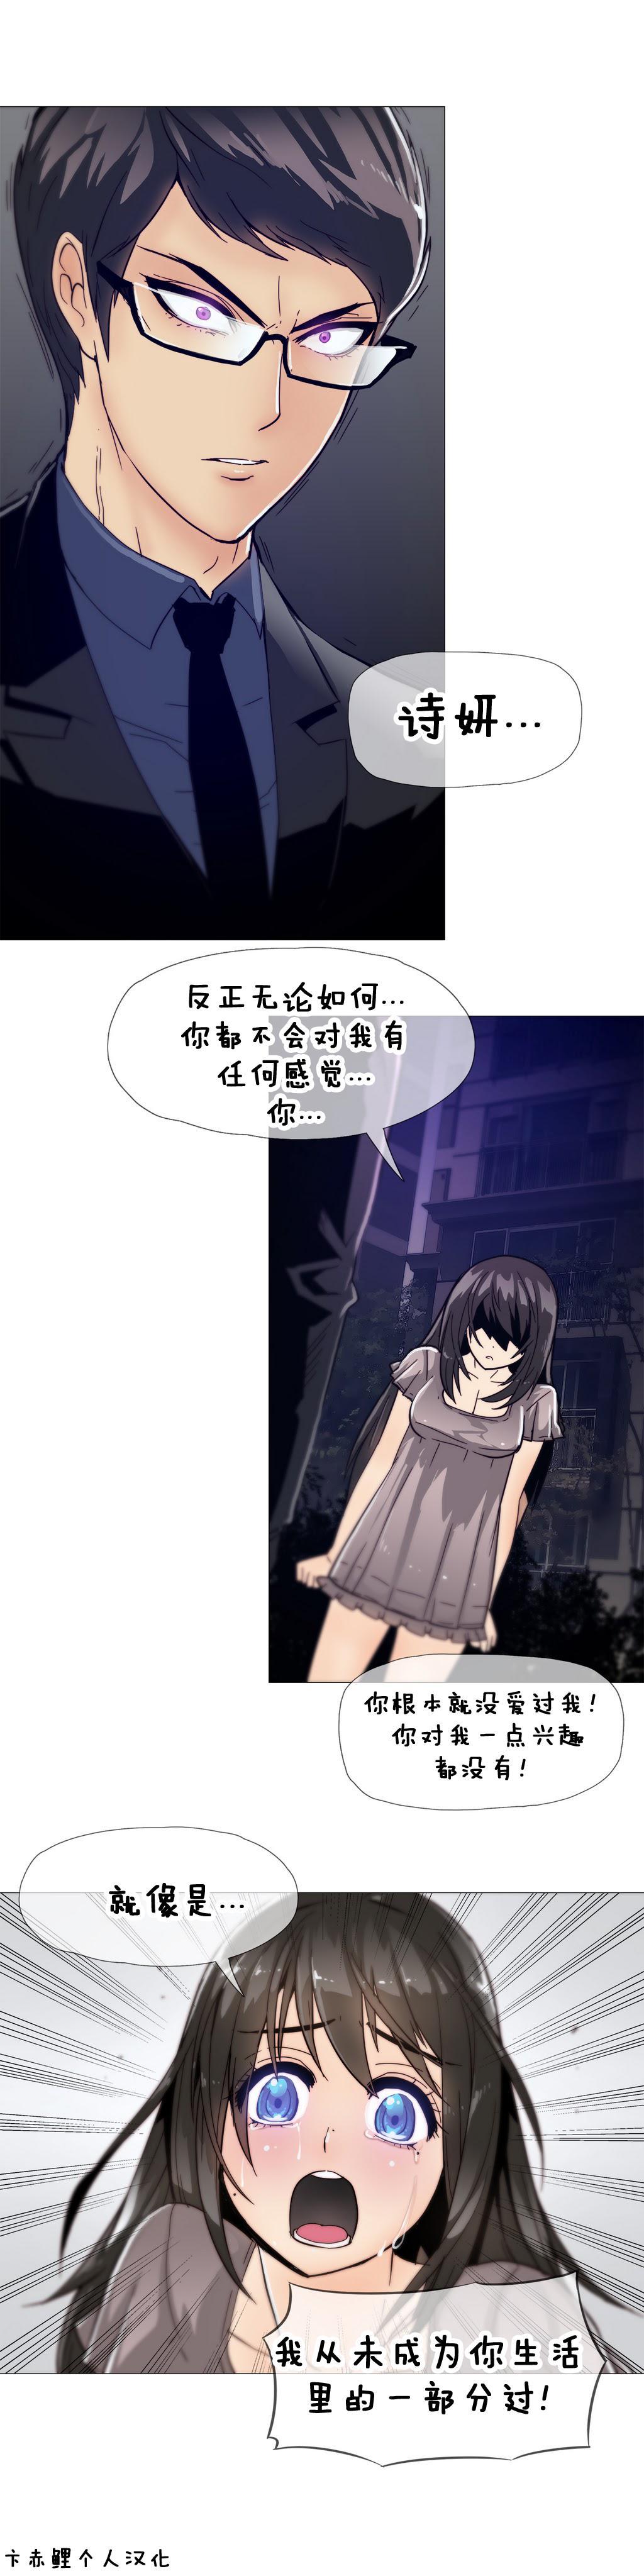 HouseHold Affairs 【卞赤鲤个人汉化】1~21话(持续更新中) 224